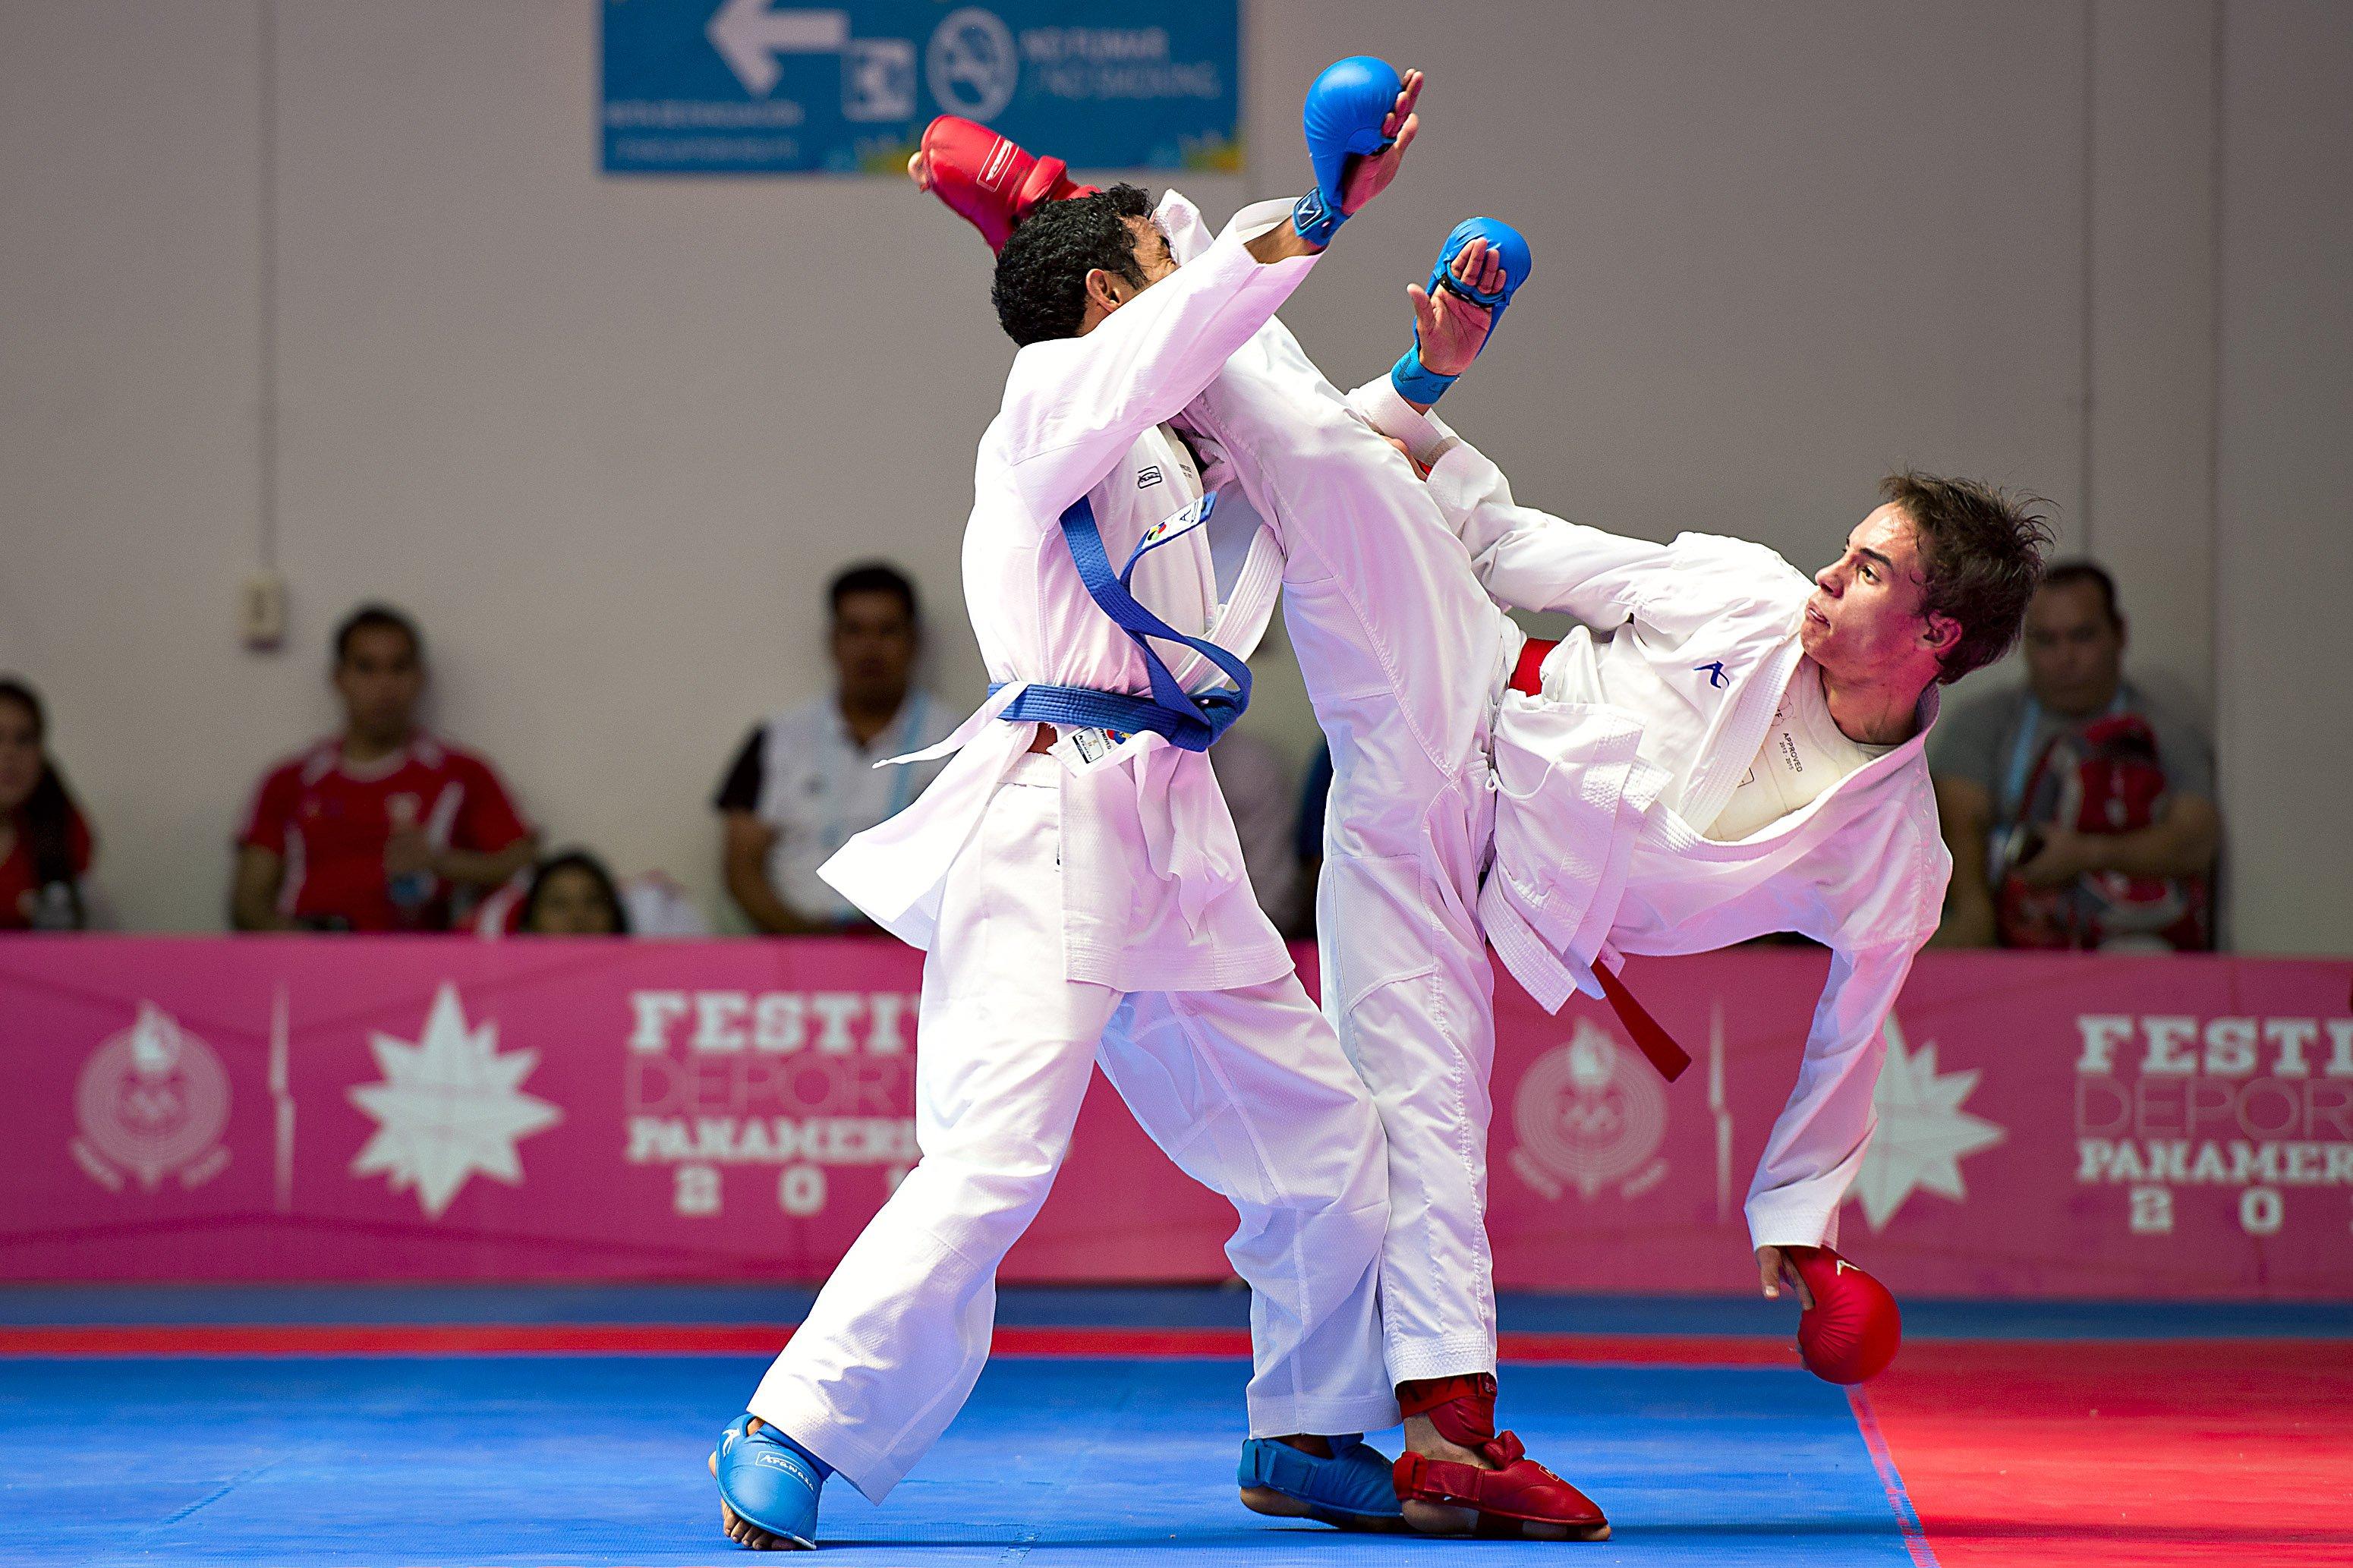 All about JKA & Shotokan Kumite